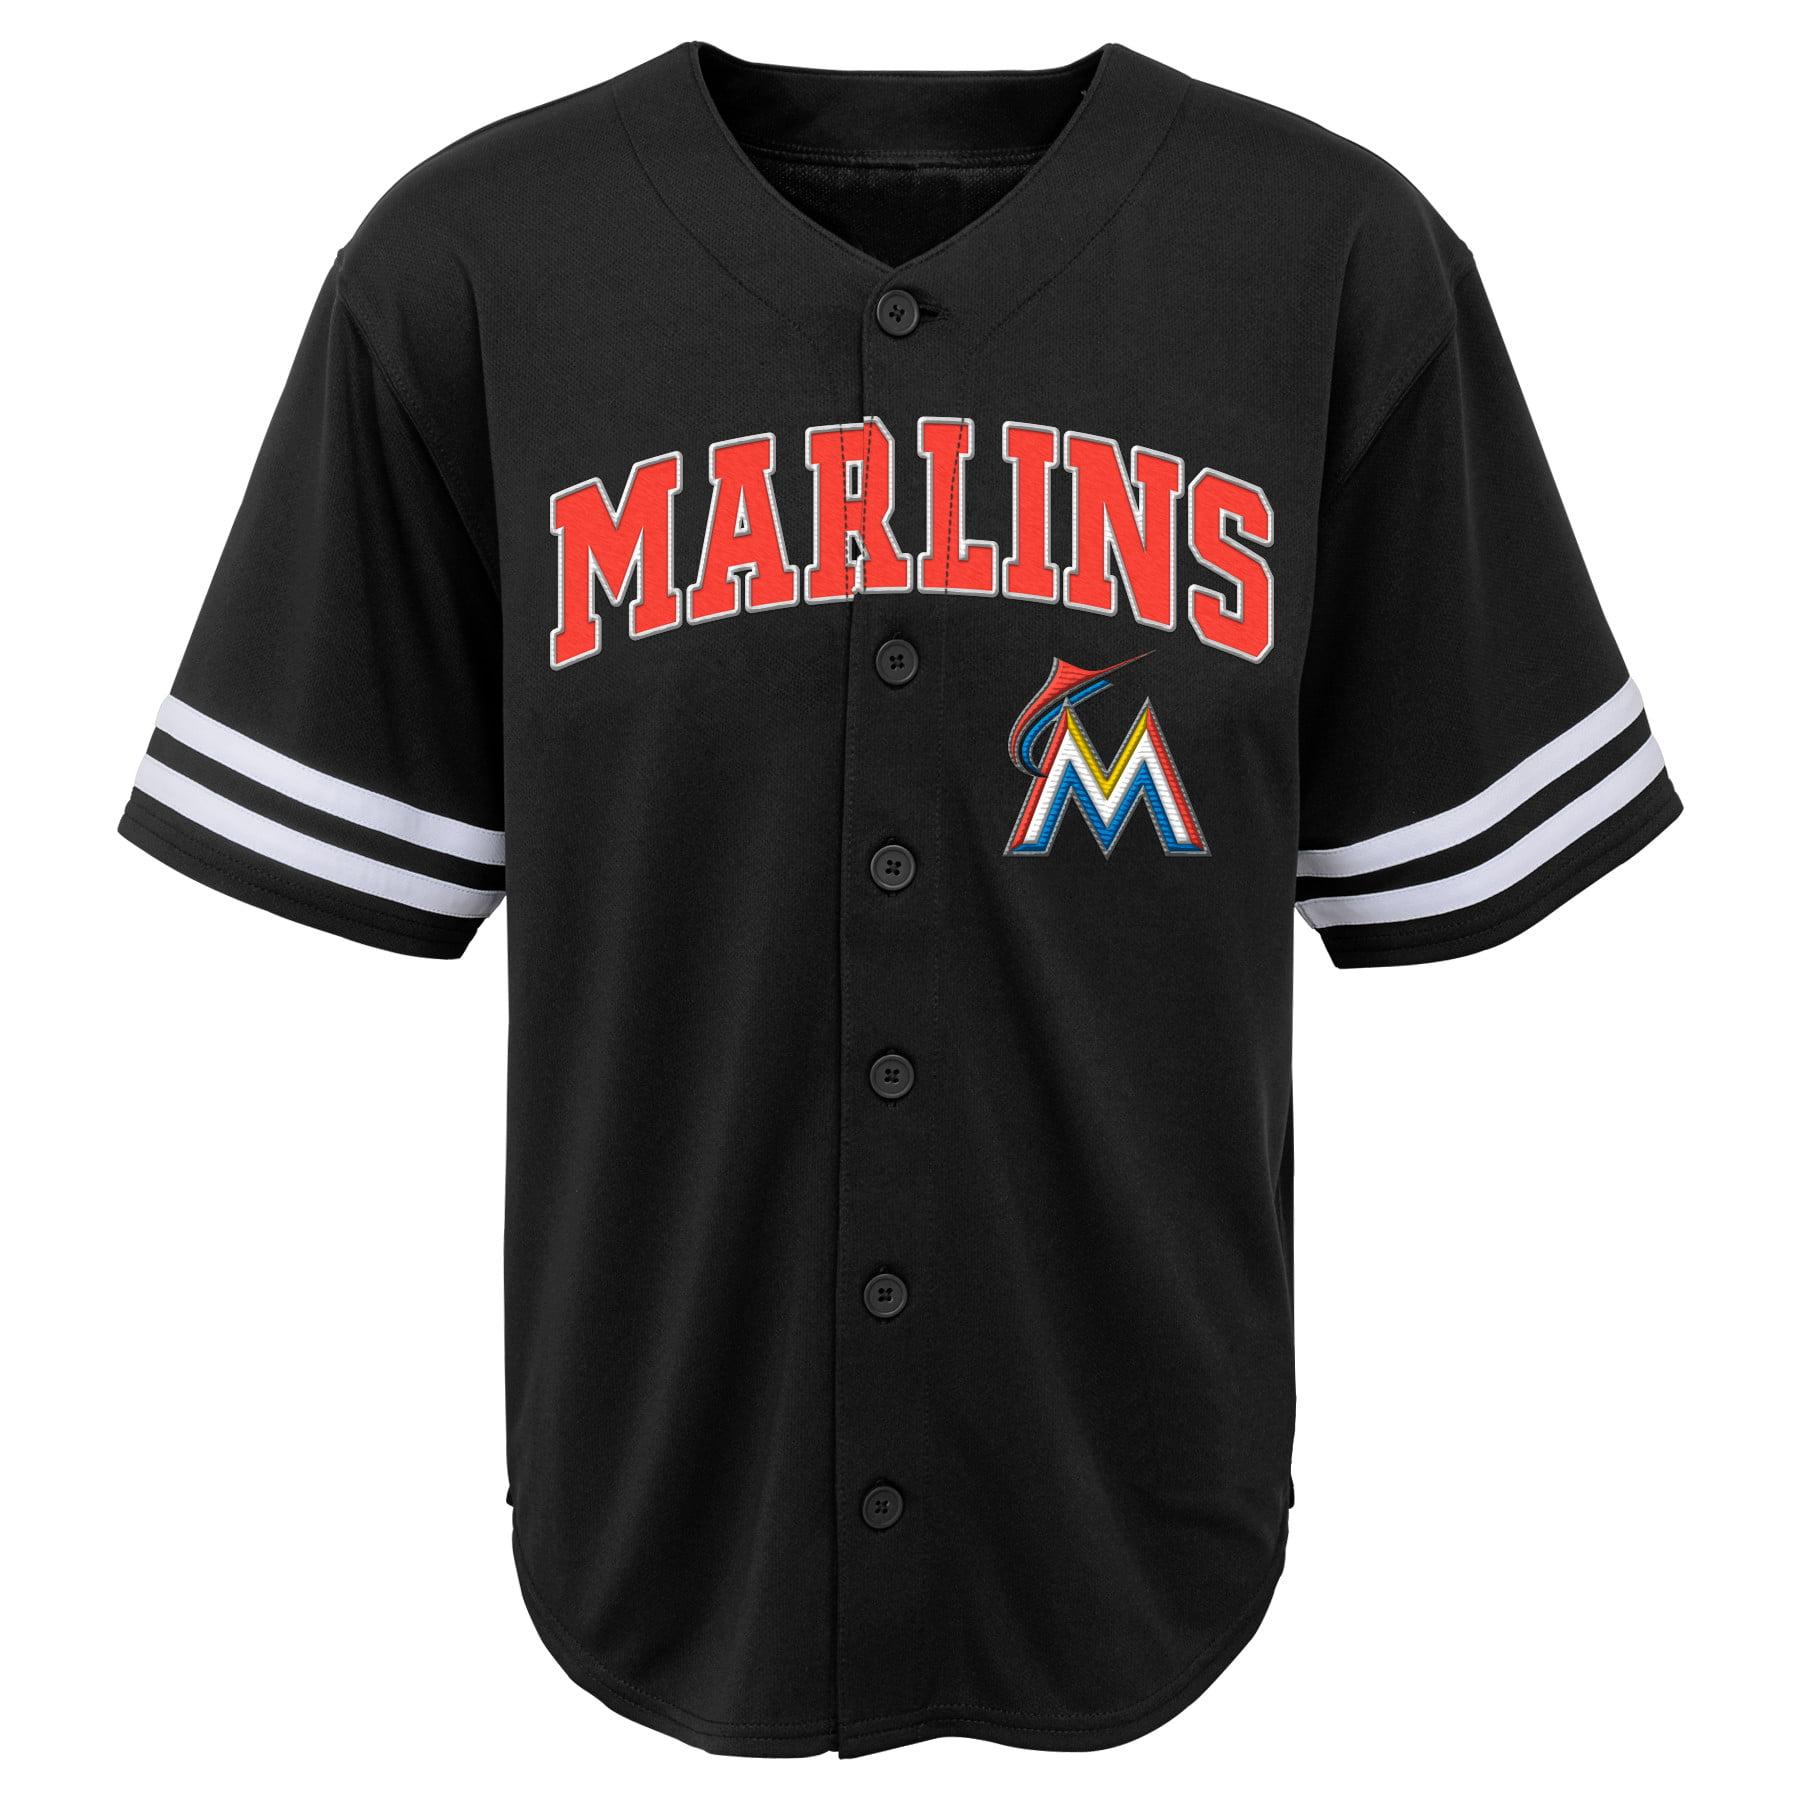 MLB Miami MARLINS TEE Short Sleeve Boys Fashion Jersey Tee 60% Cotton 40% Polyester BLACK Team Tee 4-18